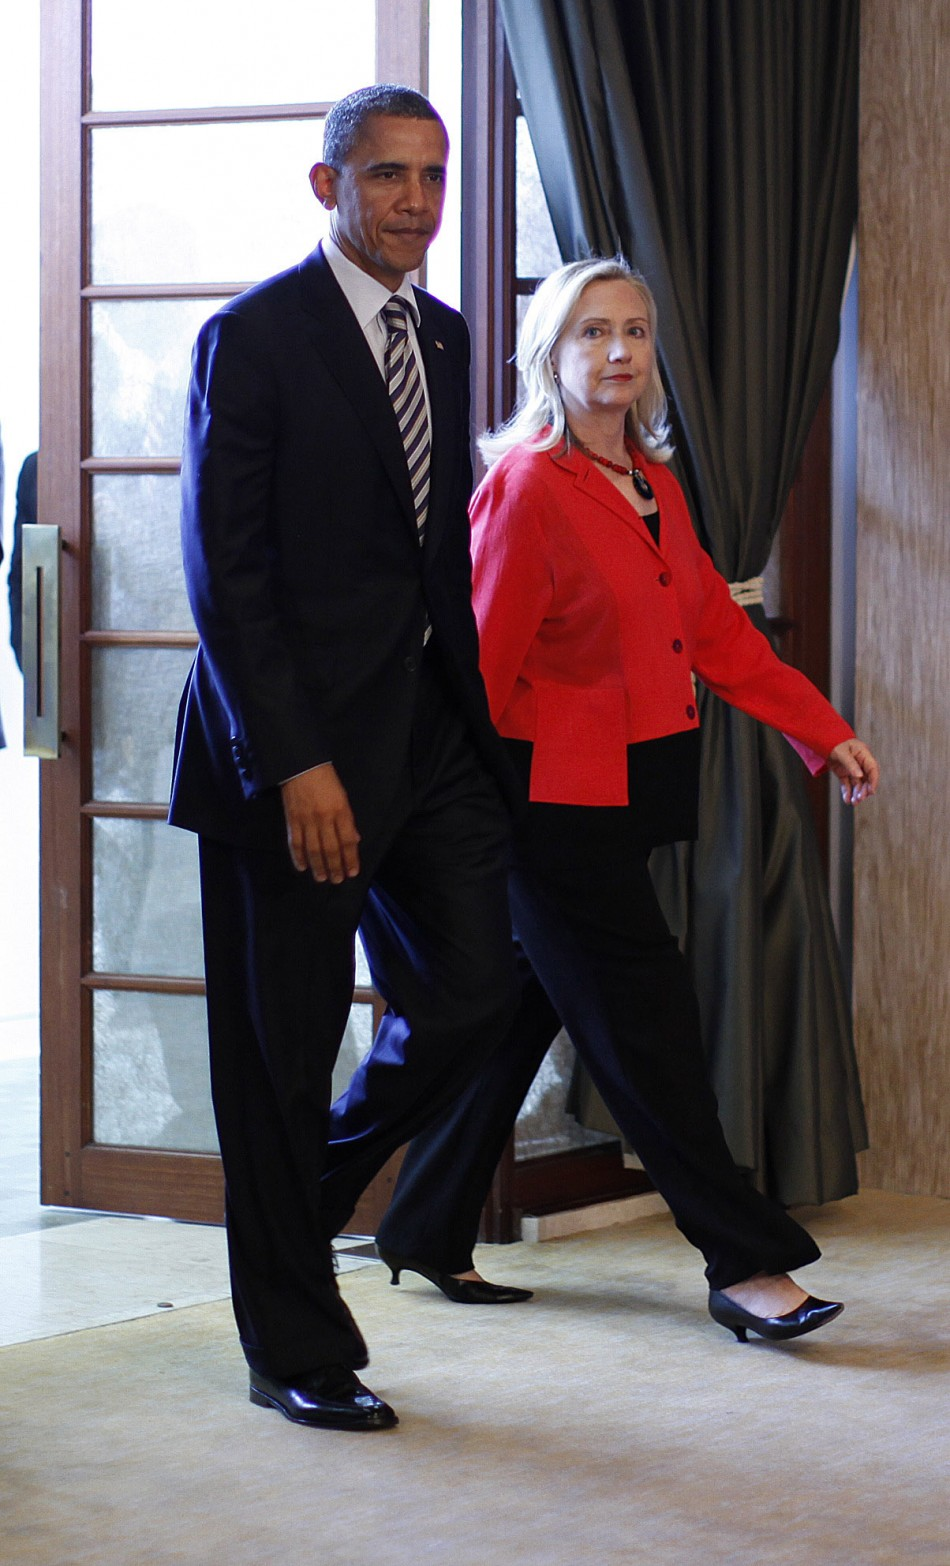 U.S. President Barack Obama and Hillary Clinton